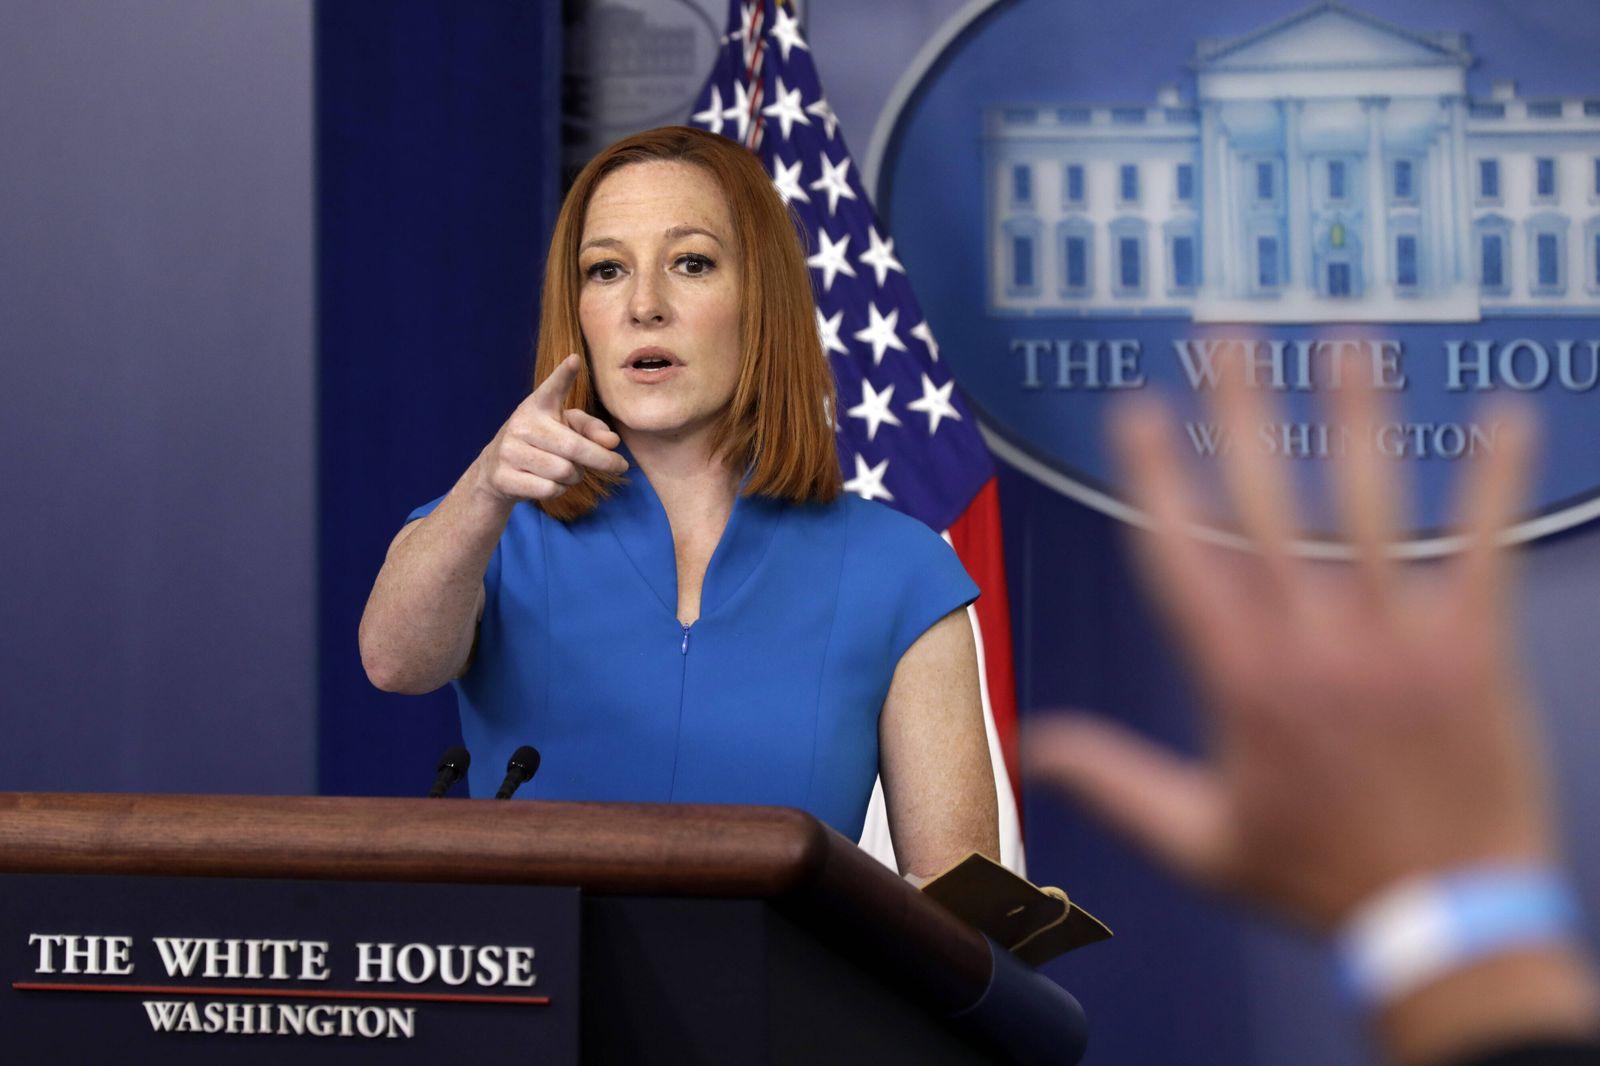 White House Press Secretary Jen Psaki speaks during the daily press briefing at the White House in Washington DC, Tuesda